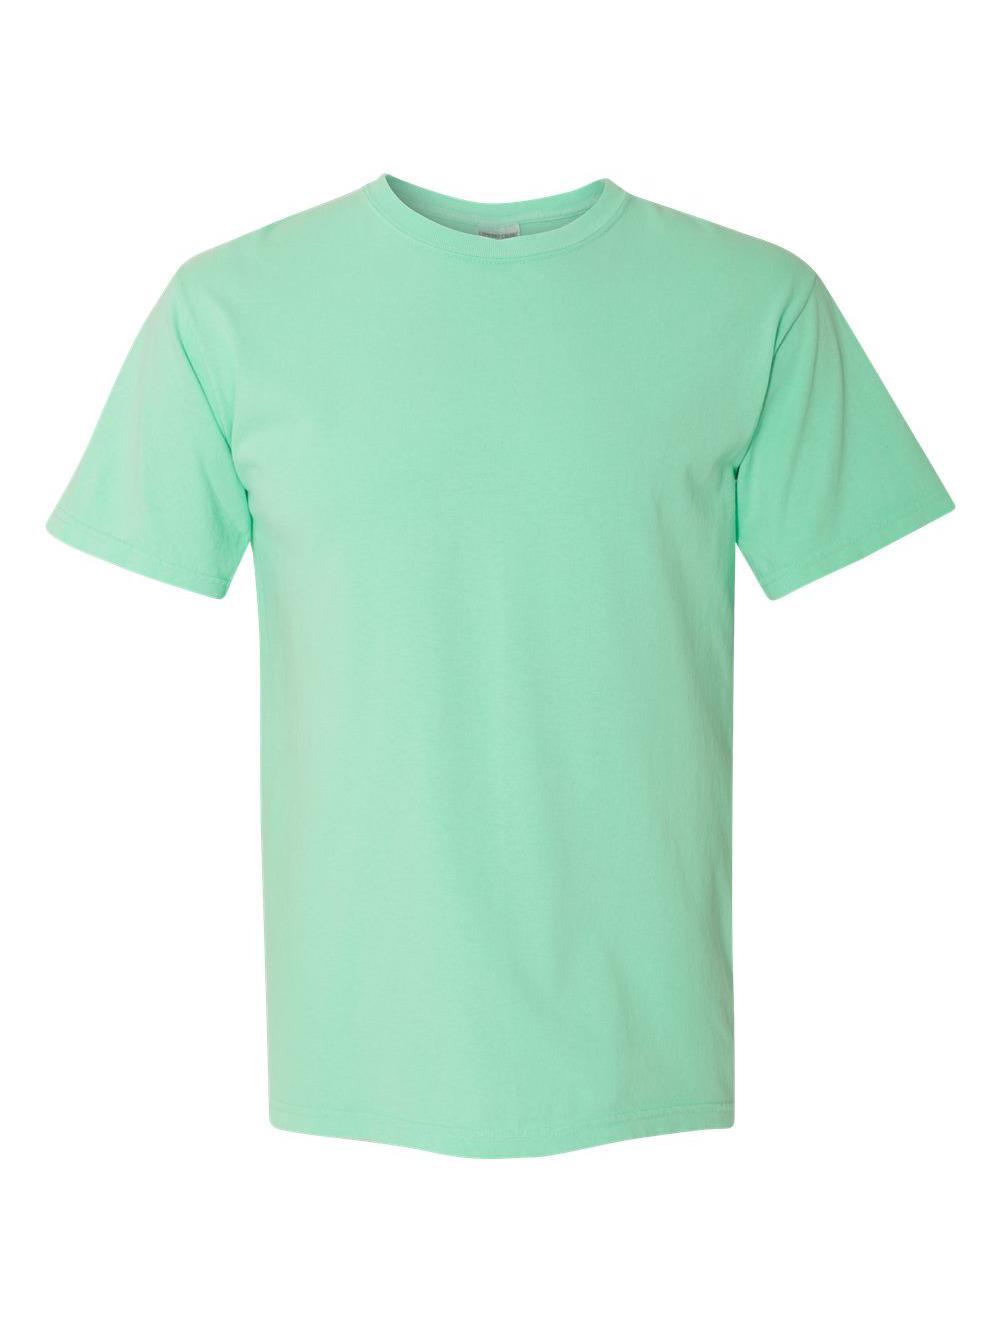 Comfort-Colors-Garment-Dyed-Heavyweight-Ringspun-Short-Sleeve-Shirt-1717 thumbnail 69